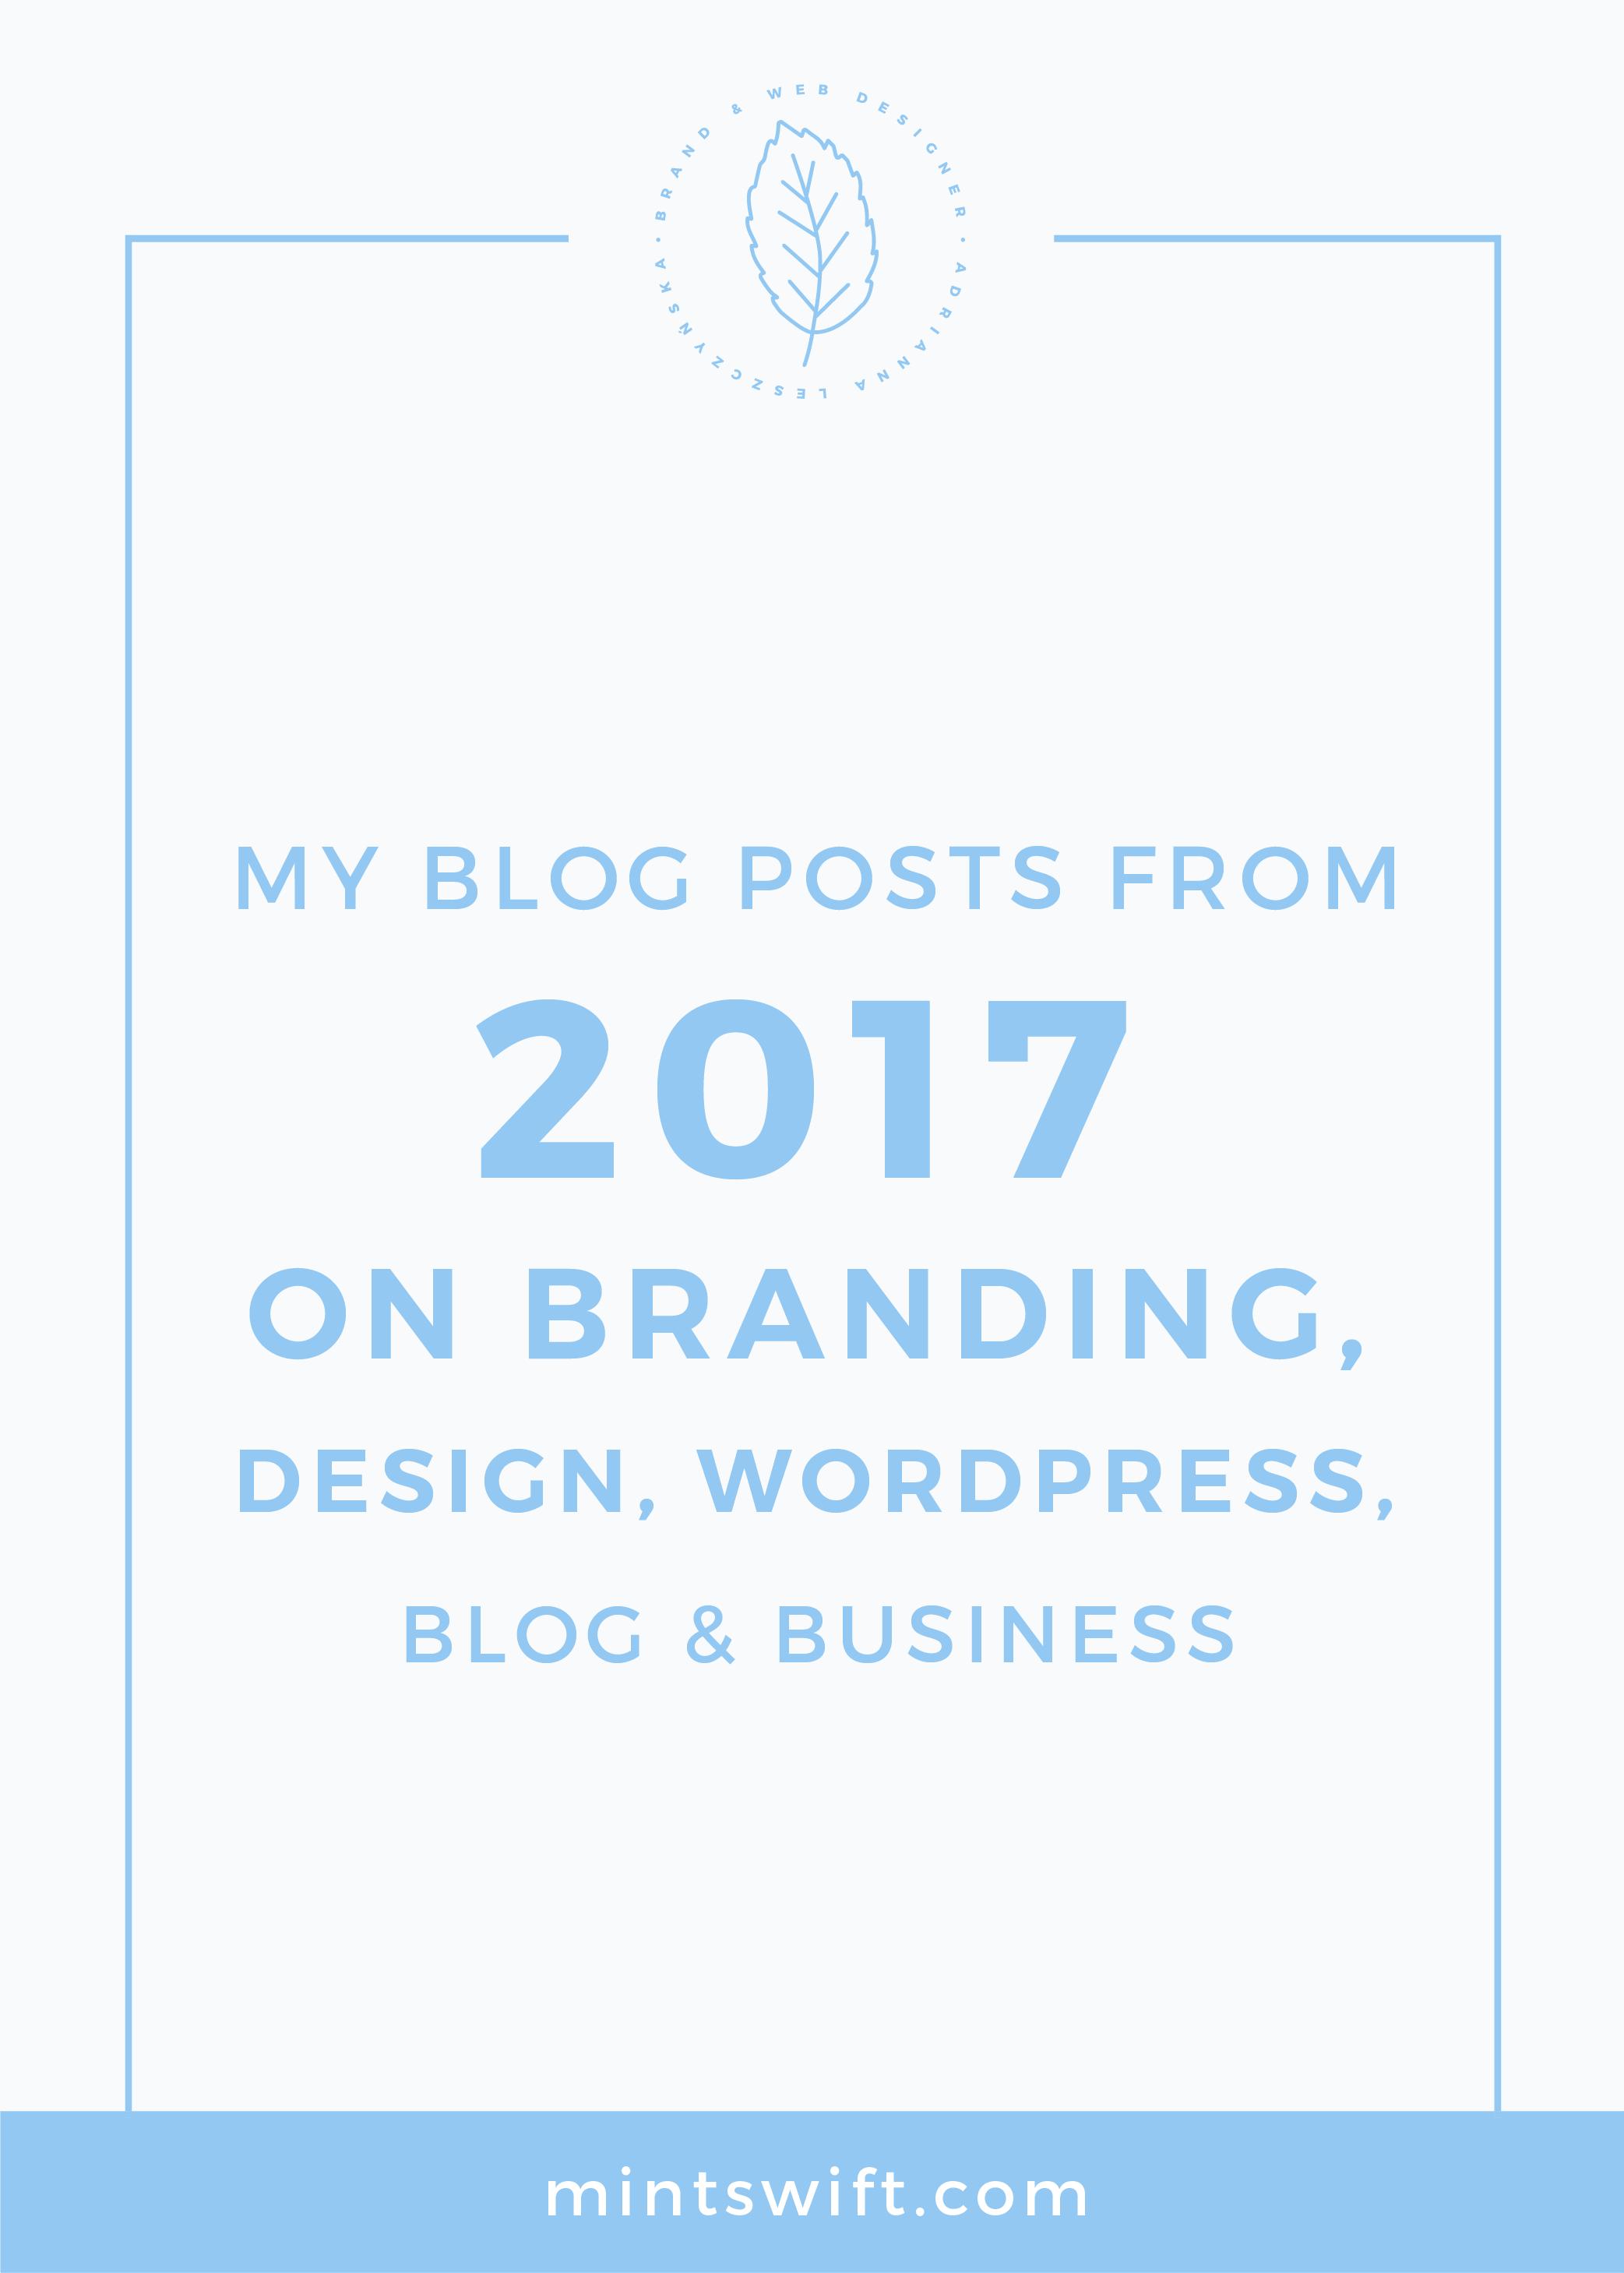 My Blog Posts from 2017 on Branding, Design, WordPress, Business & Blogging MintSwift